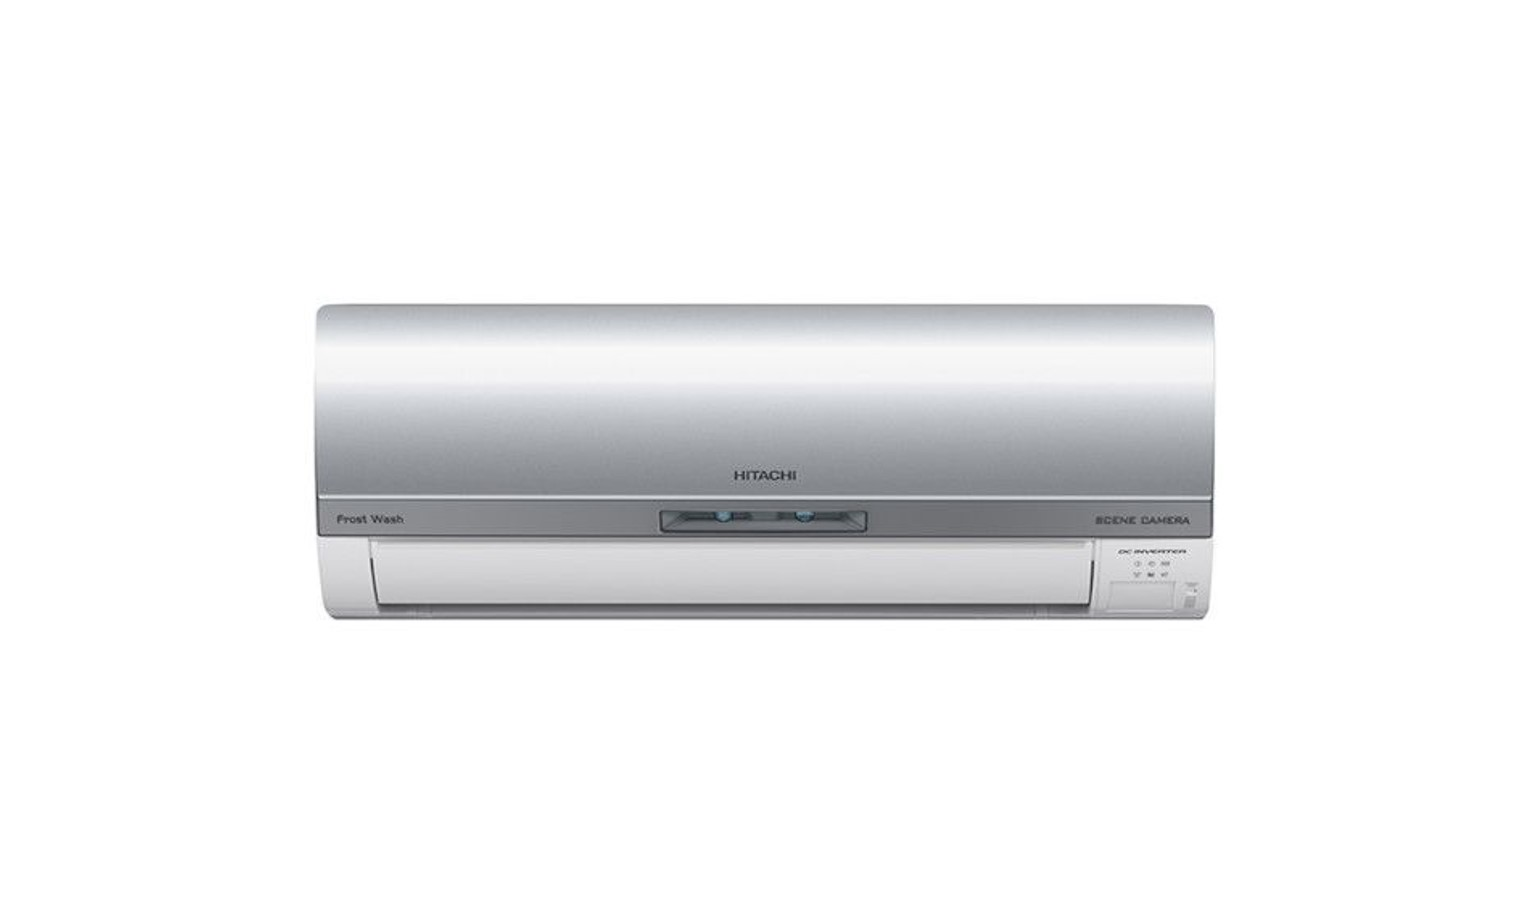 Hitachi RAS-VX18CJ 2.0HP Premium Inverter Series Air Conditioner